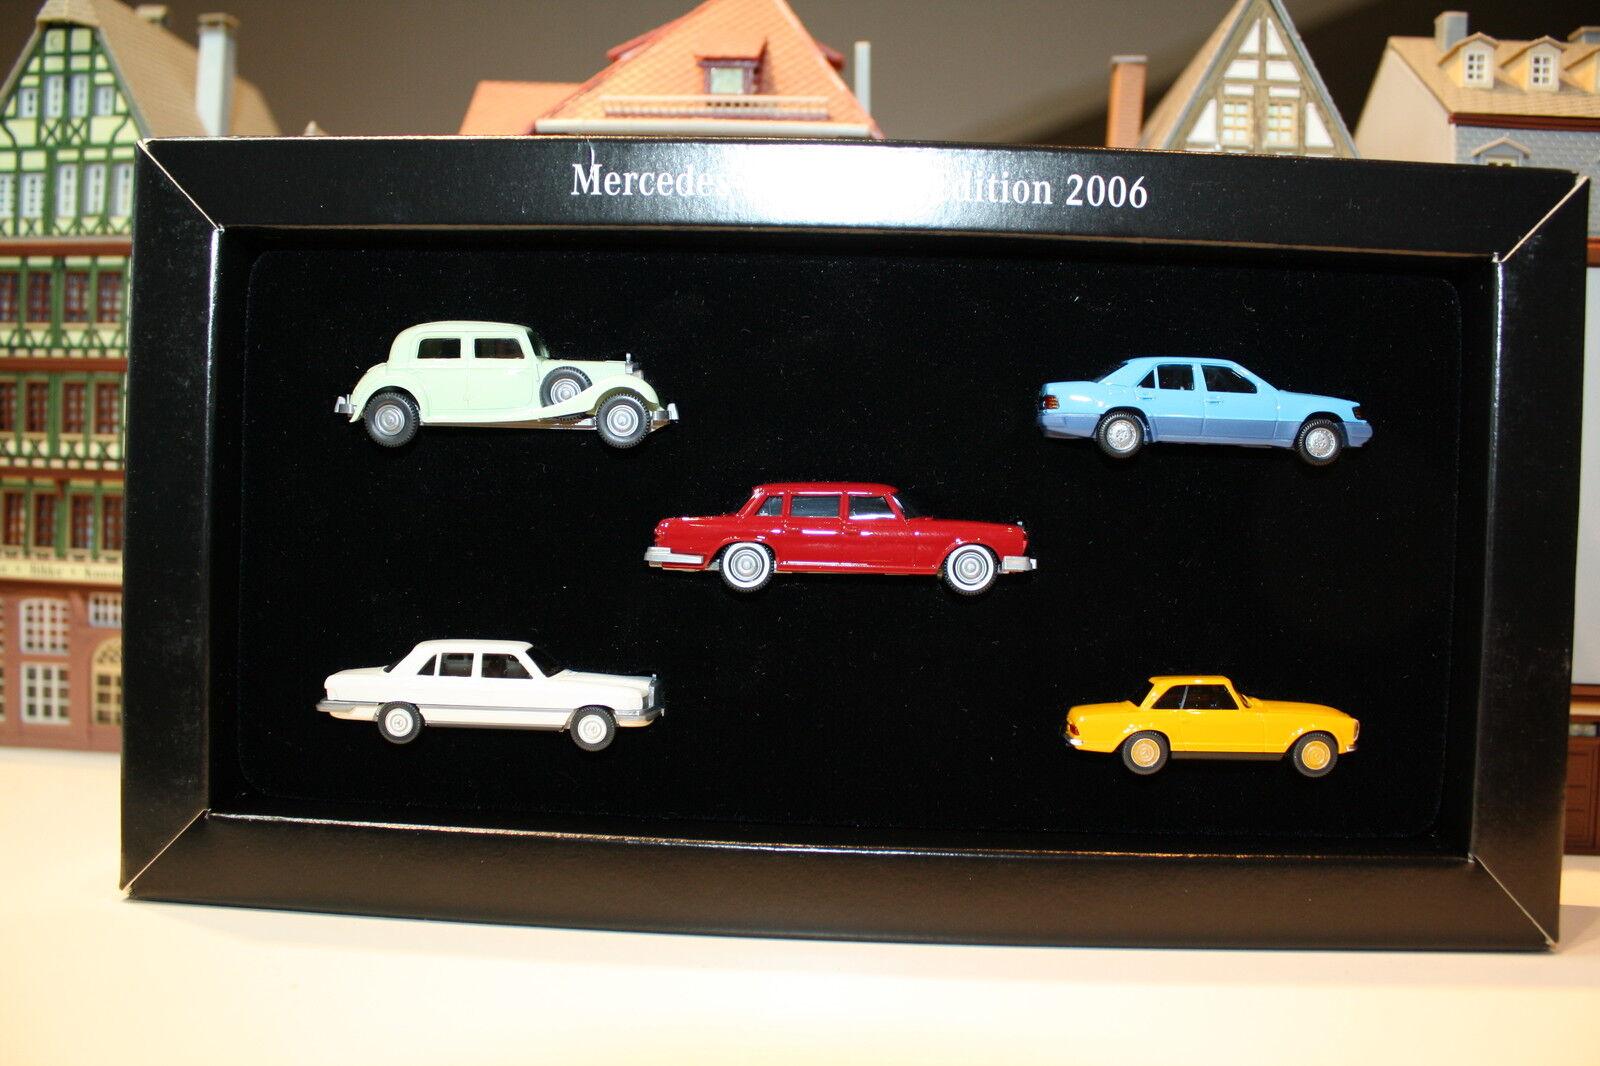 Mercedes-Benz Club Edition 2006 Set (Wiking H S 64